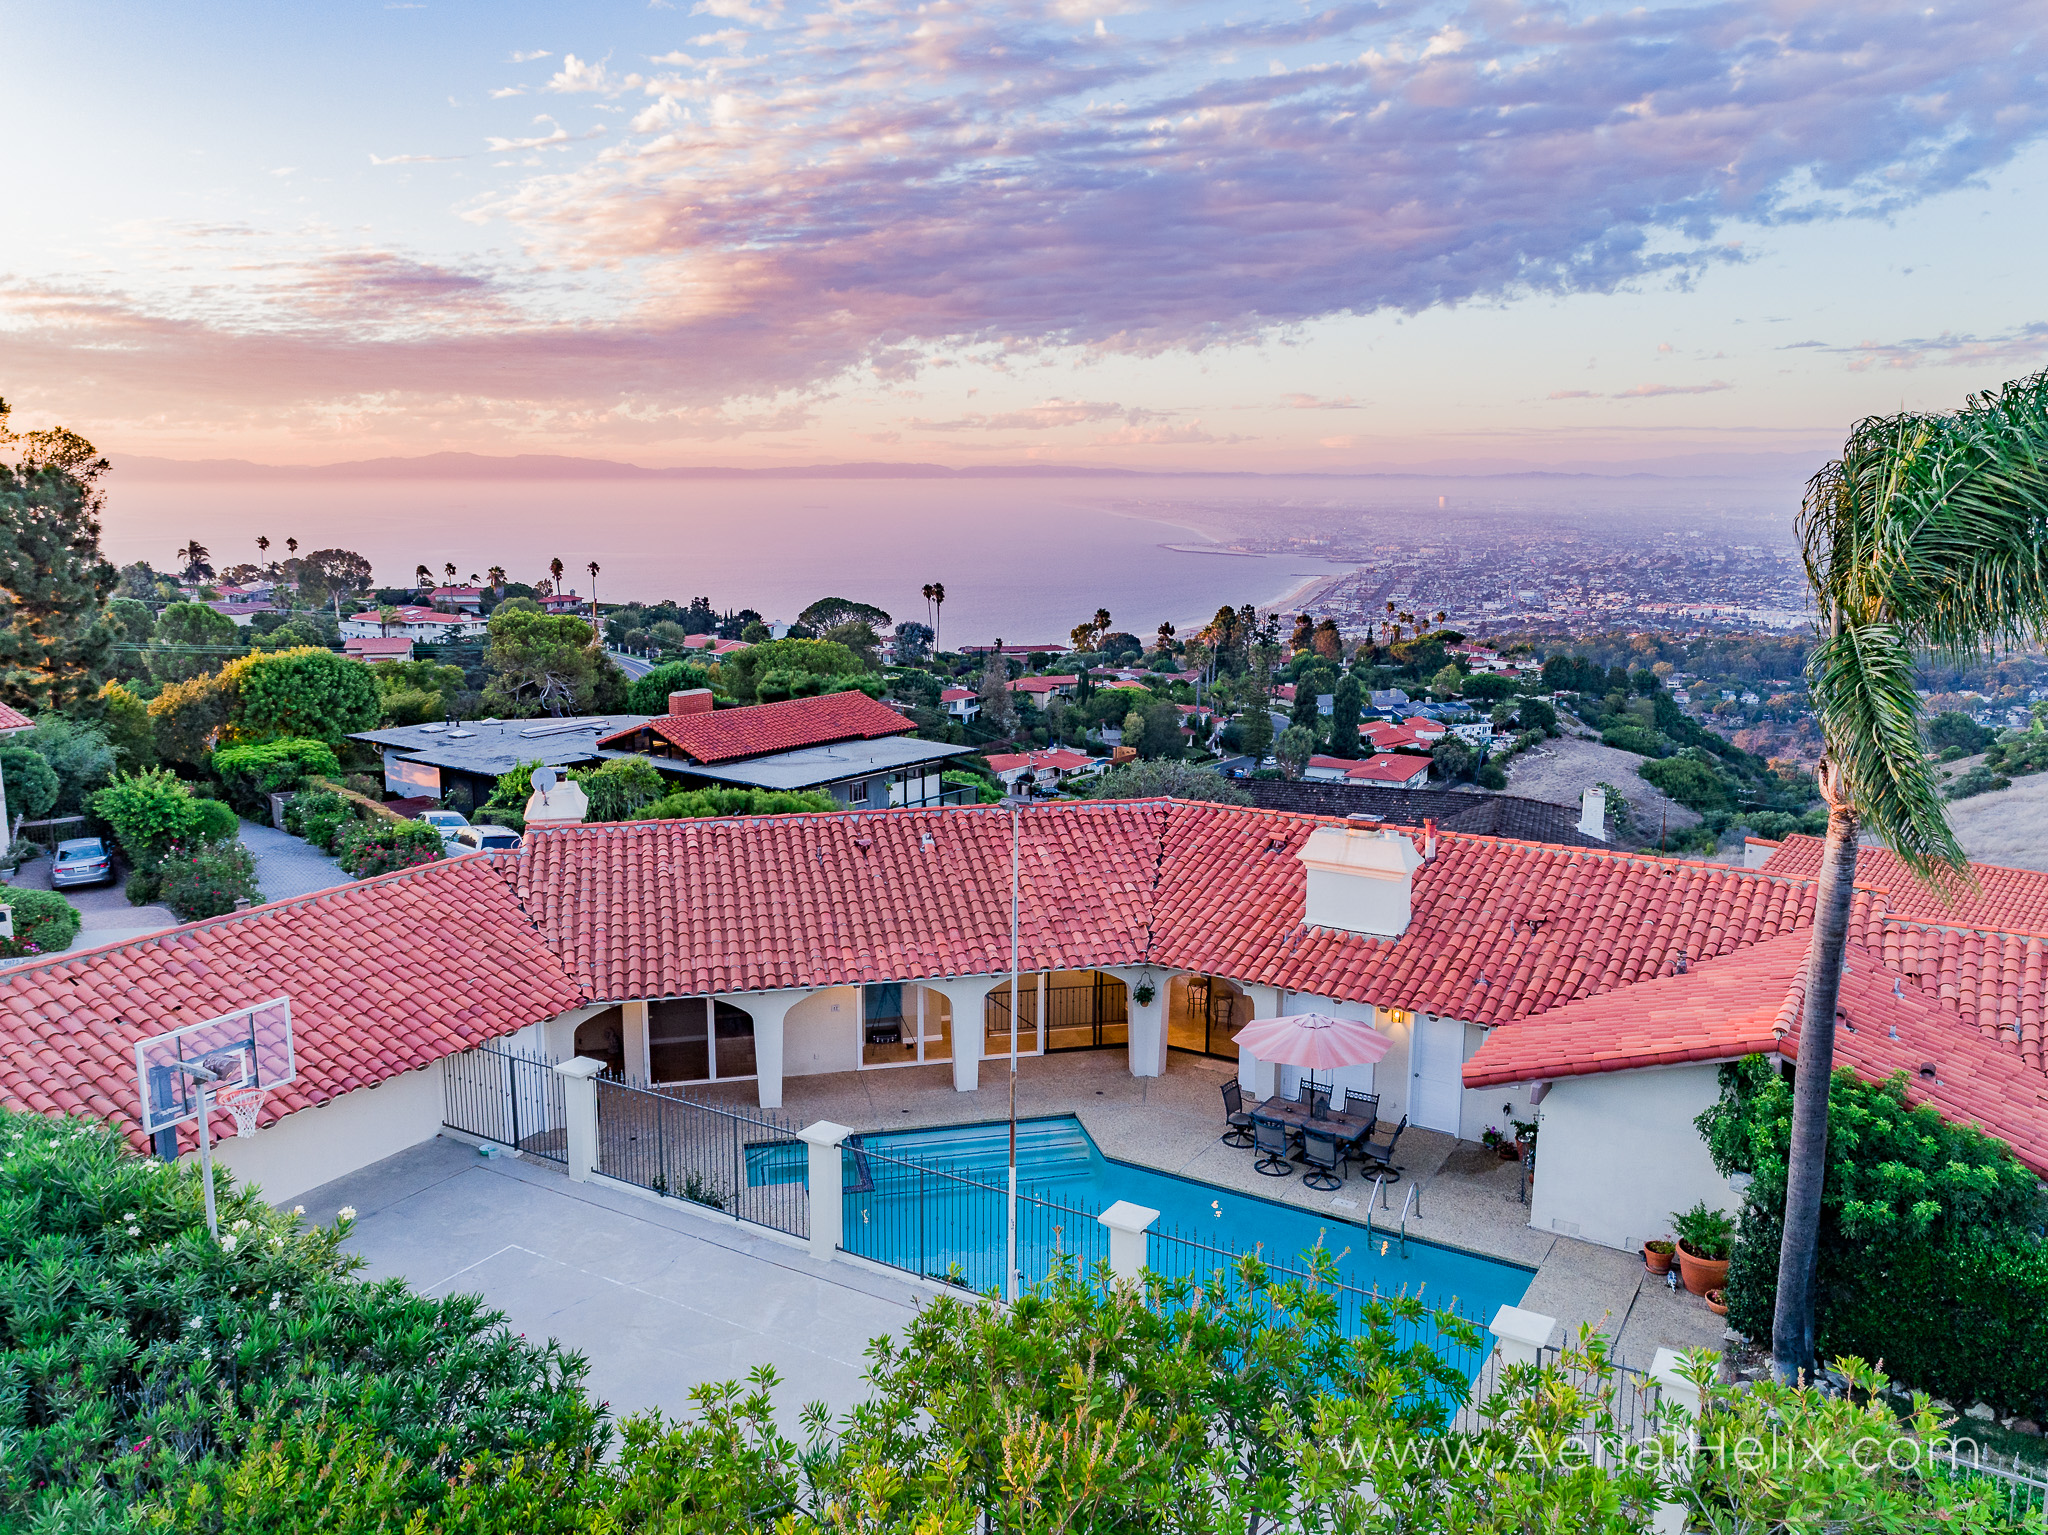 Woodfern Drive - HELIX Real Estate Aerial Photographer-28.jpg